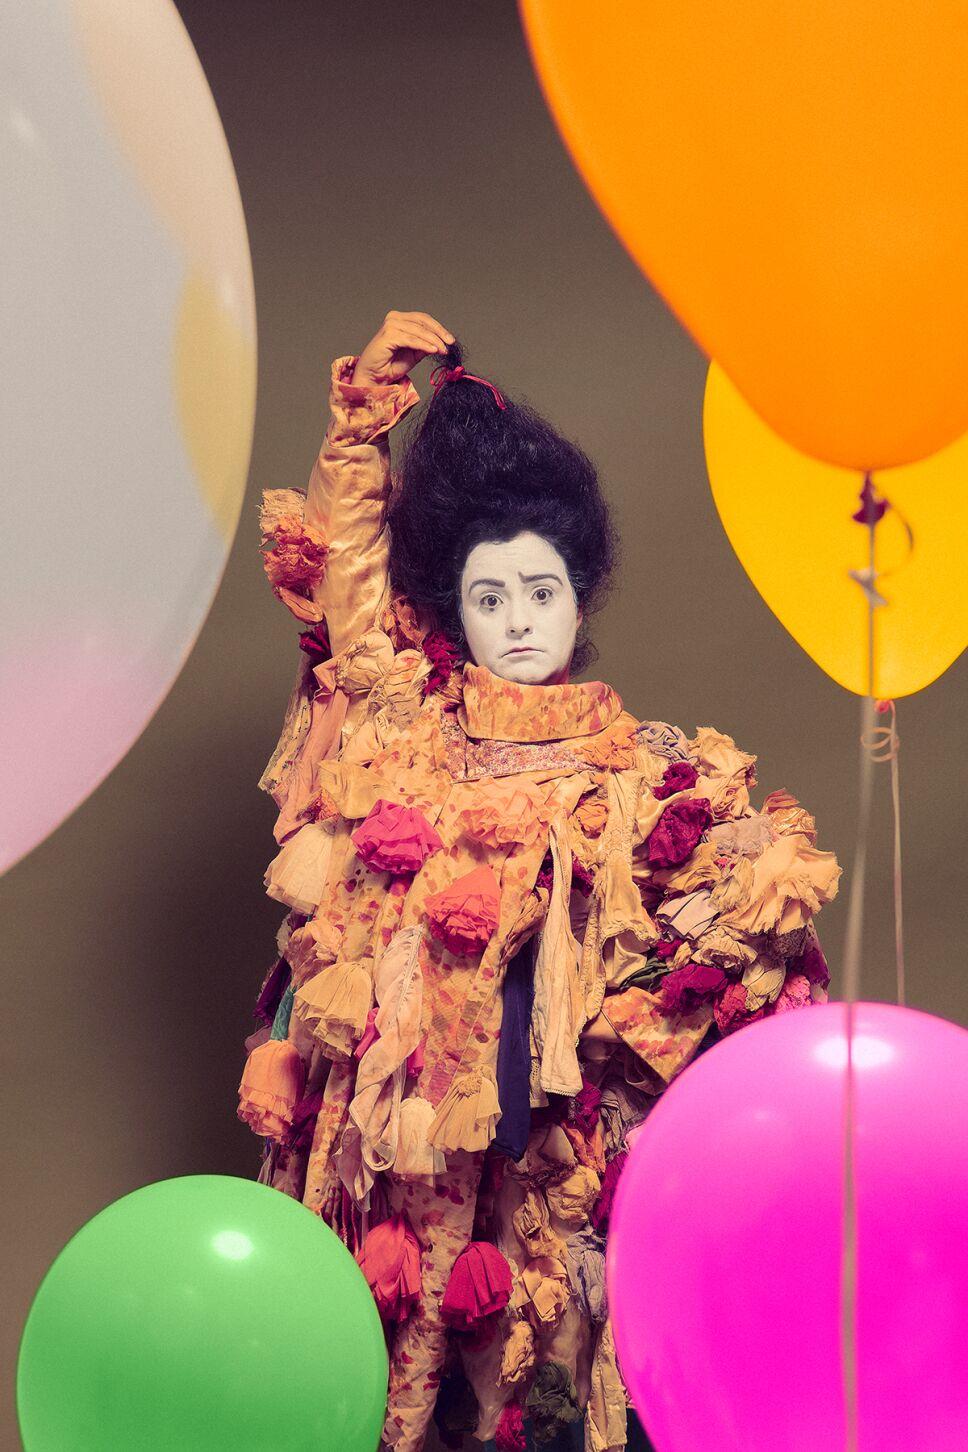 Chula The Clown